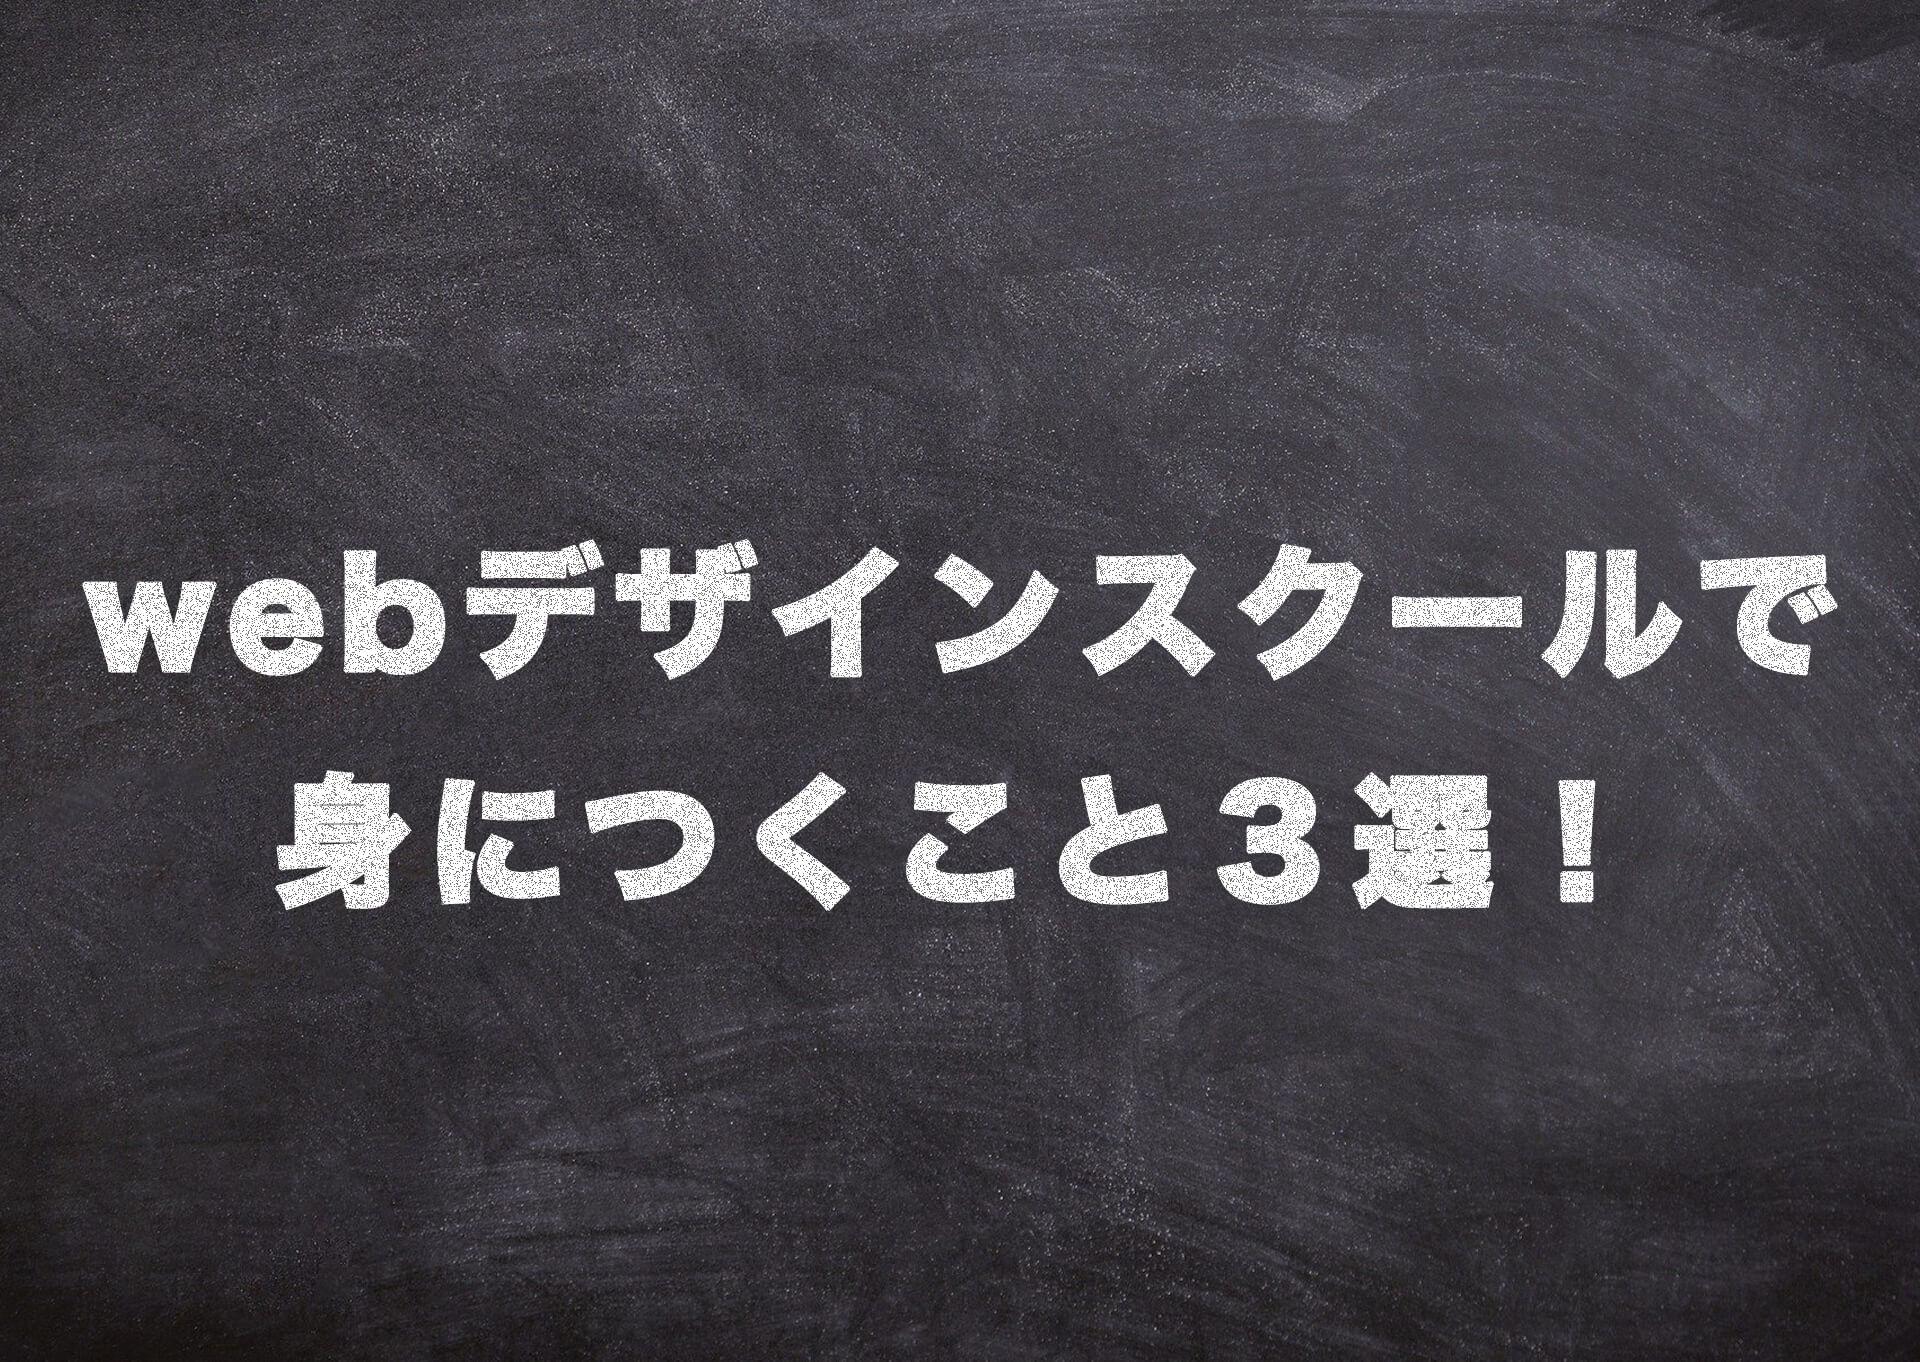 webデザイン、スクール、学ぶ2−3